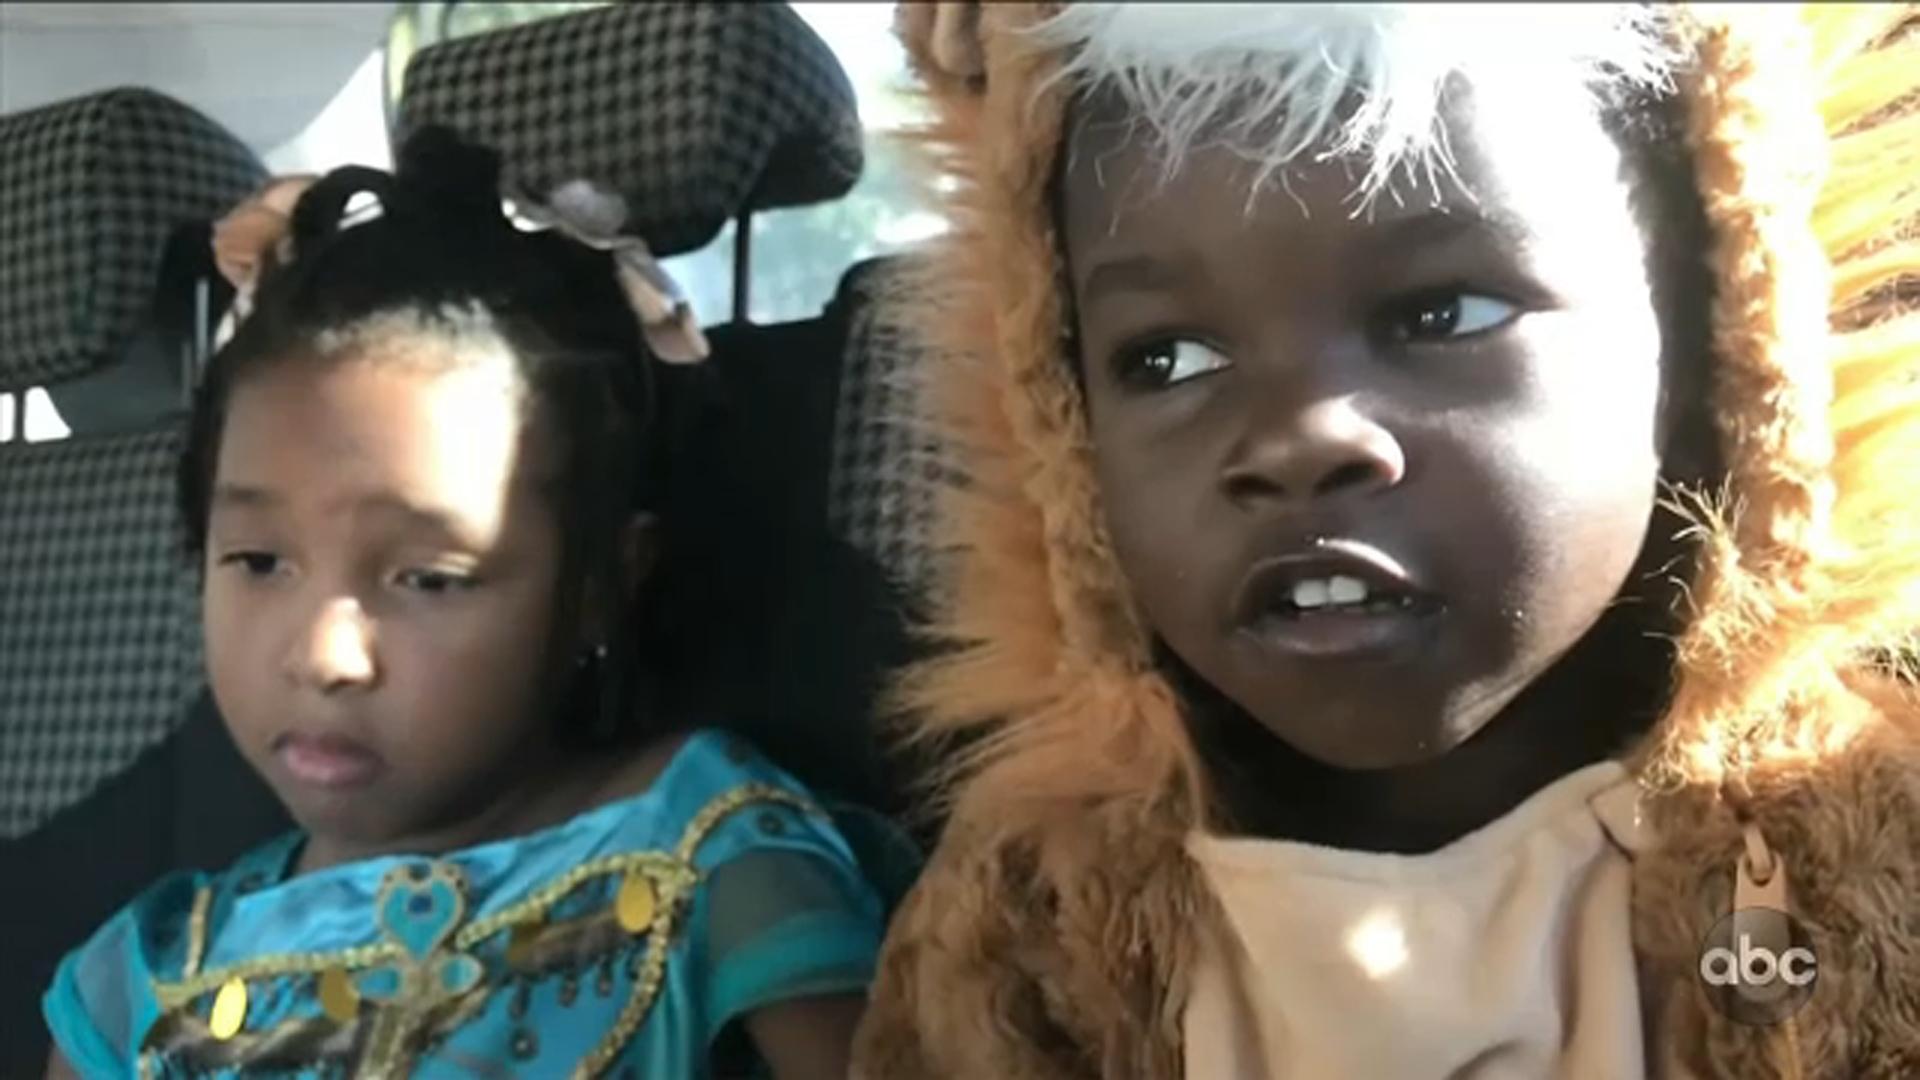 Halloween Candy Jimmy Kimmel 2020 Parents trick kids again in 'Hey Jimmy Kimmel, I Told My Kids I